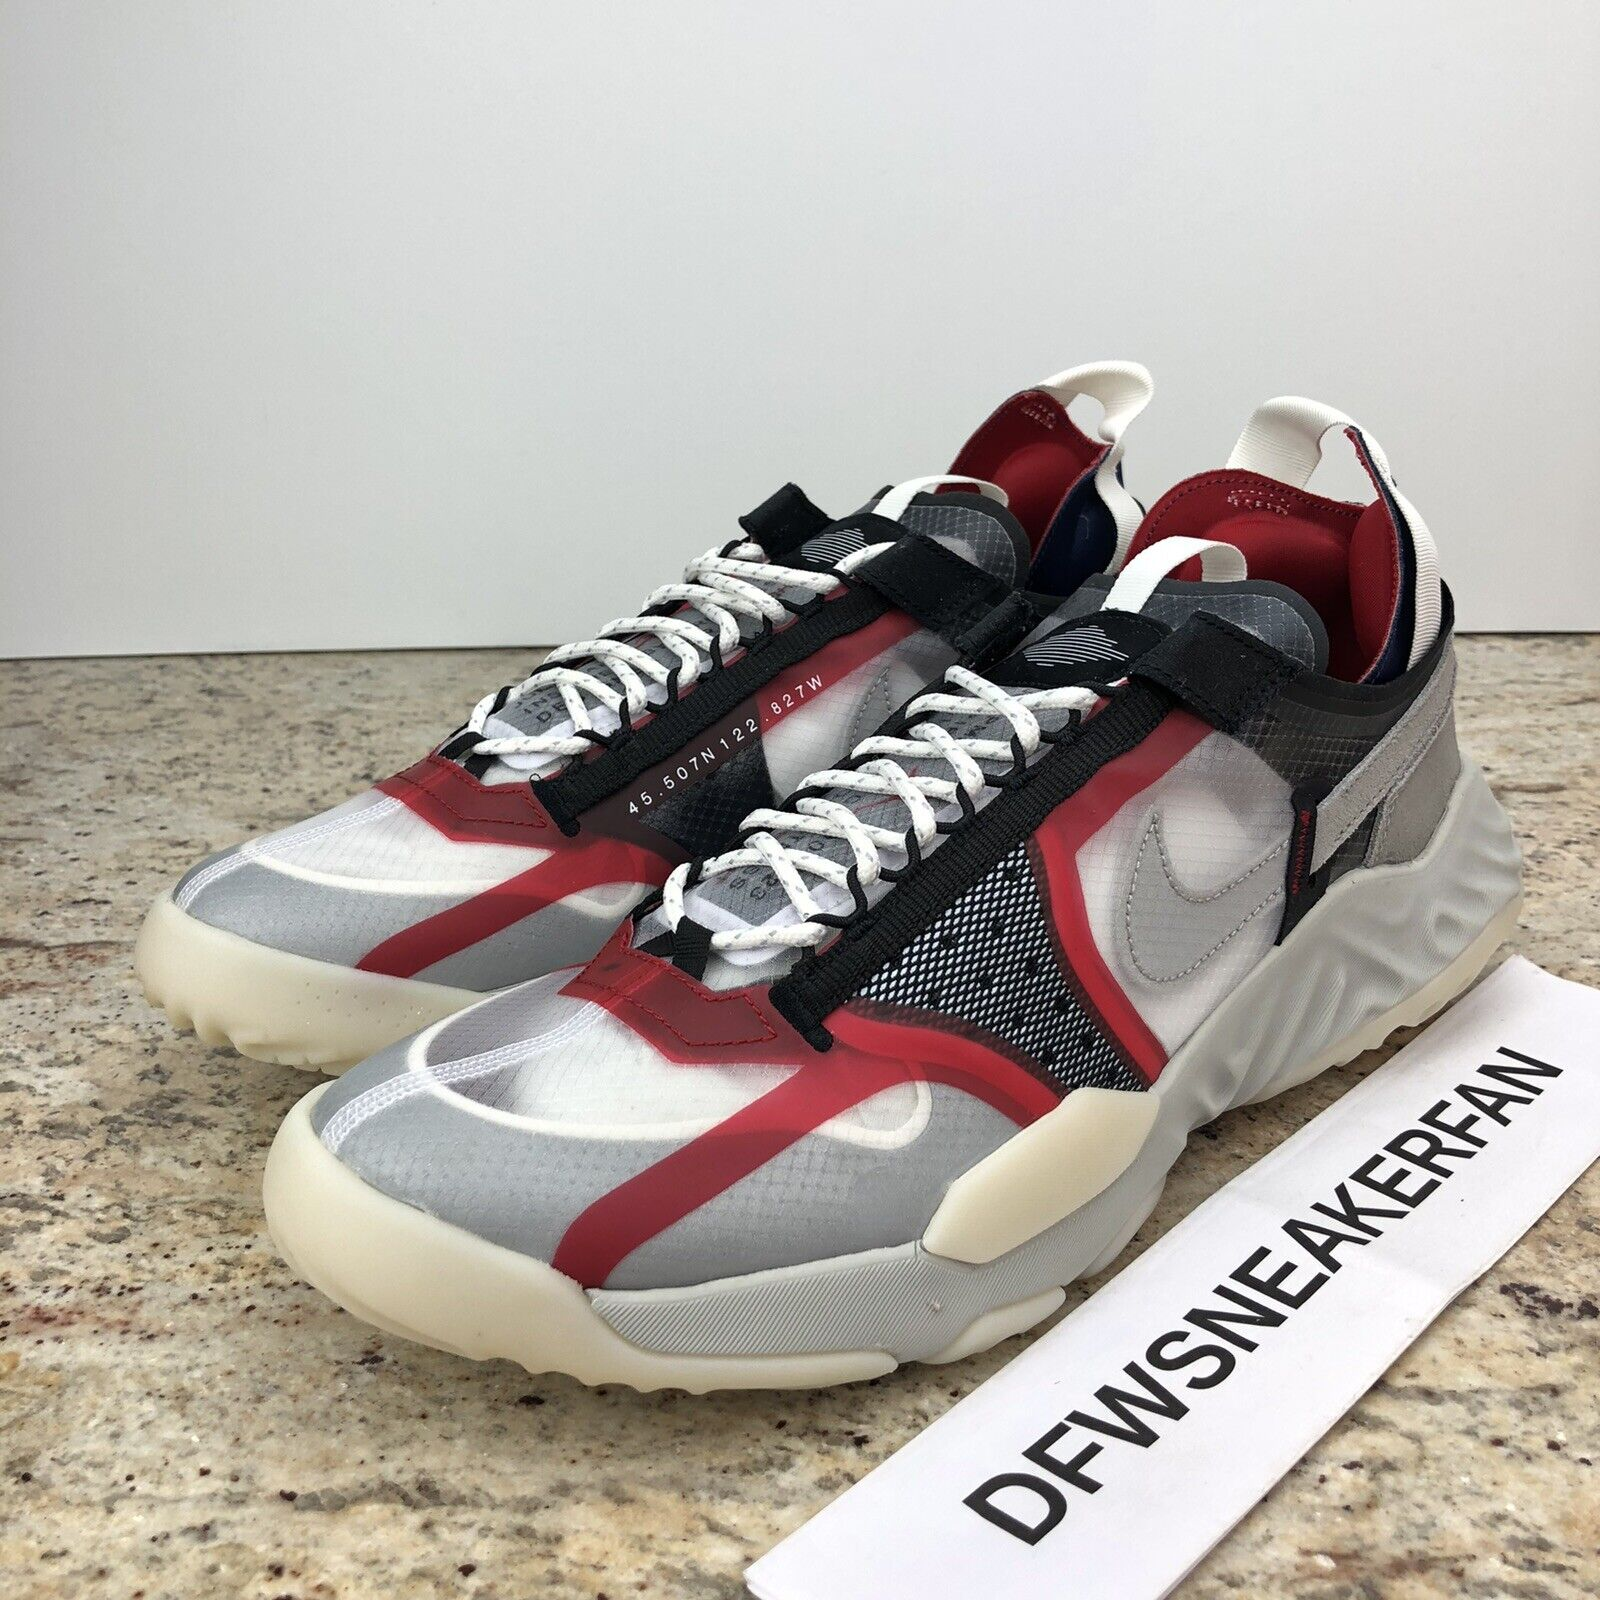 Nike Air Jordan Delta Breathe Gray Bone CW0783 901 Men's 11.5 New